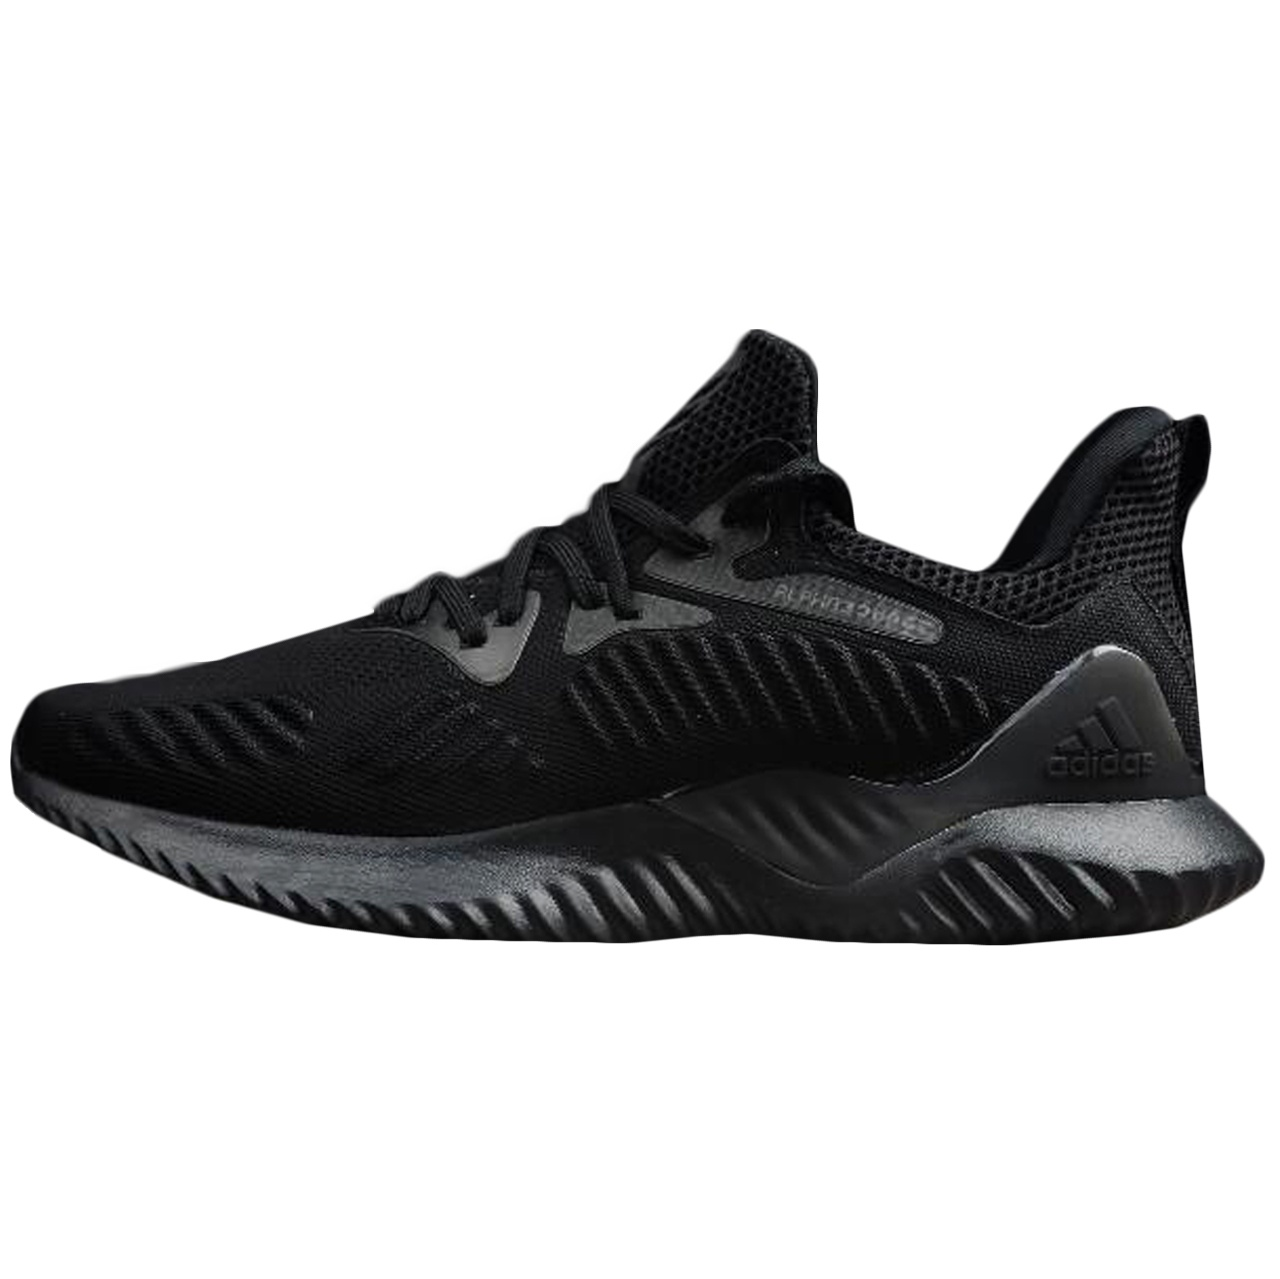 کفش مخصوص دویدن مردانه آدیداس مدل  Alphabounce beyond M کد 987340